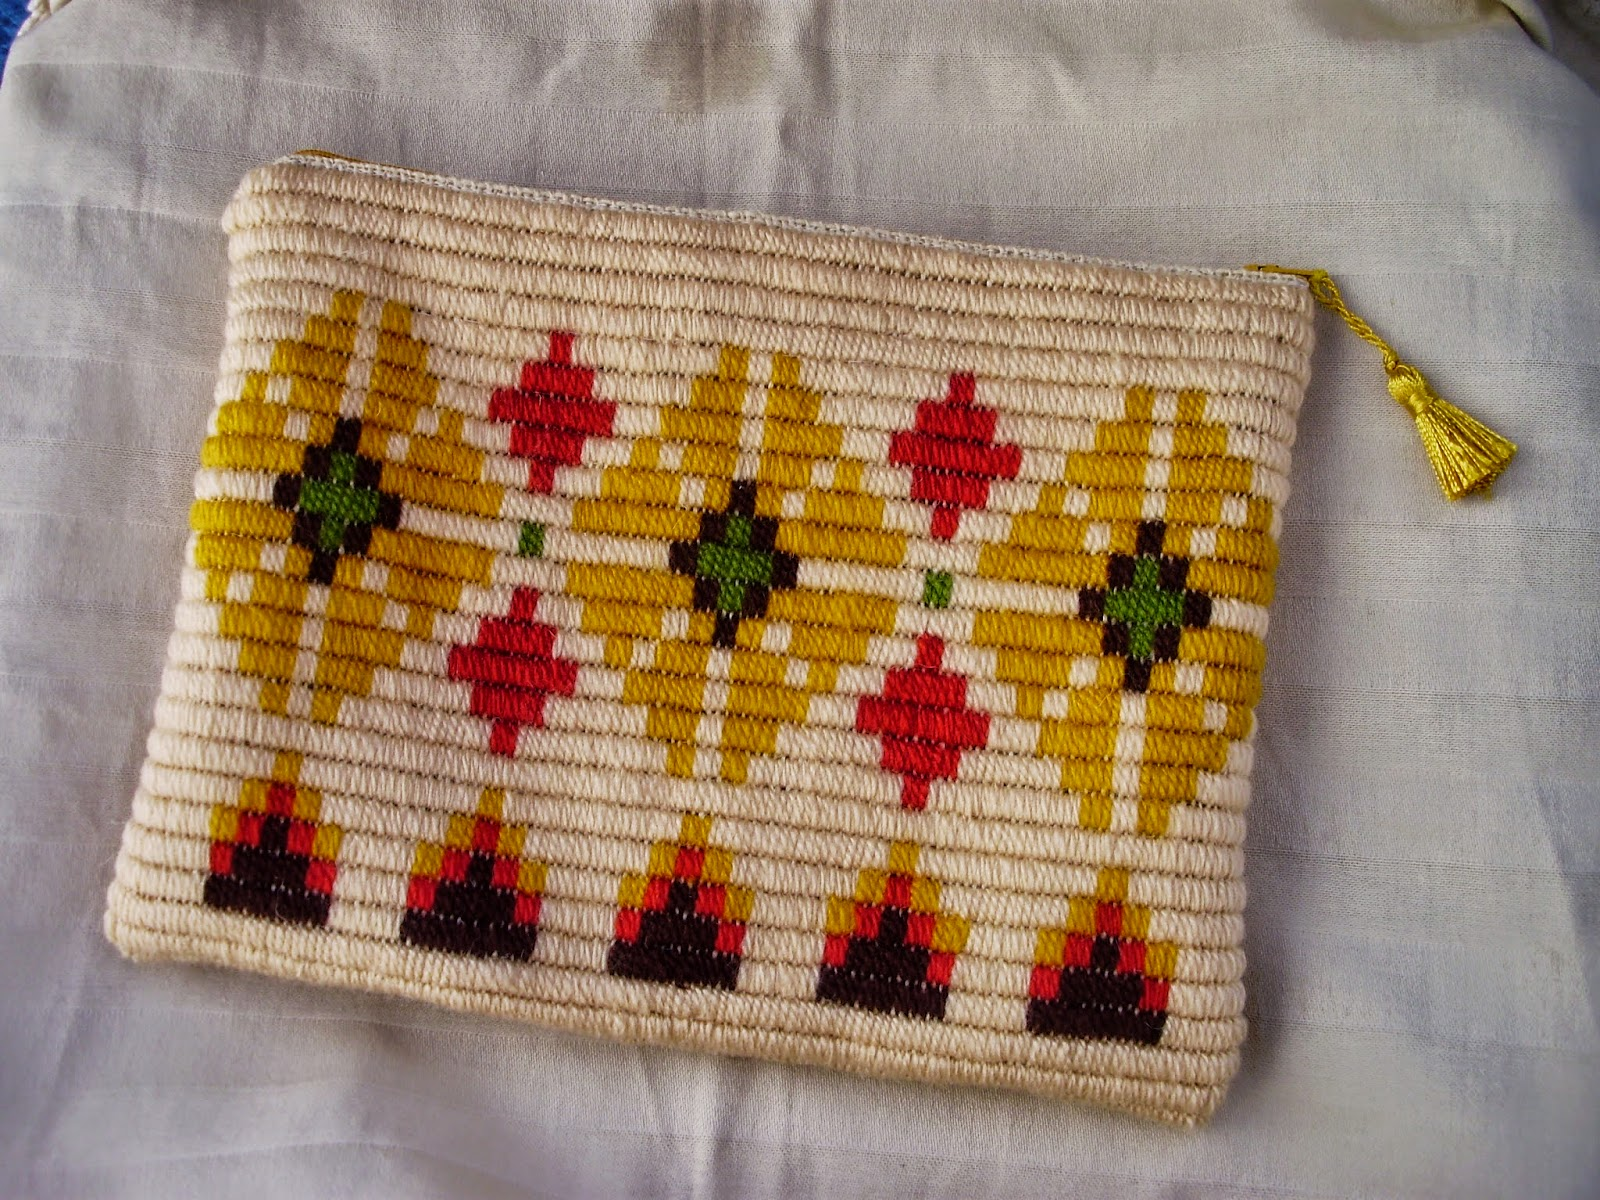 La mar de manualidades bolsitos bordados en tela y en saco - Manualidades con tela de saco ...